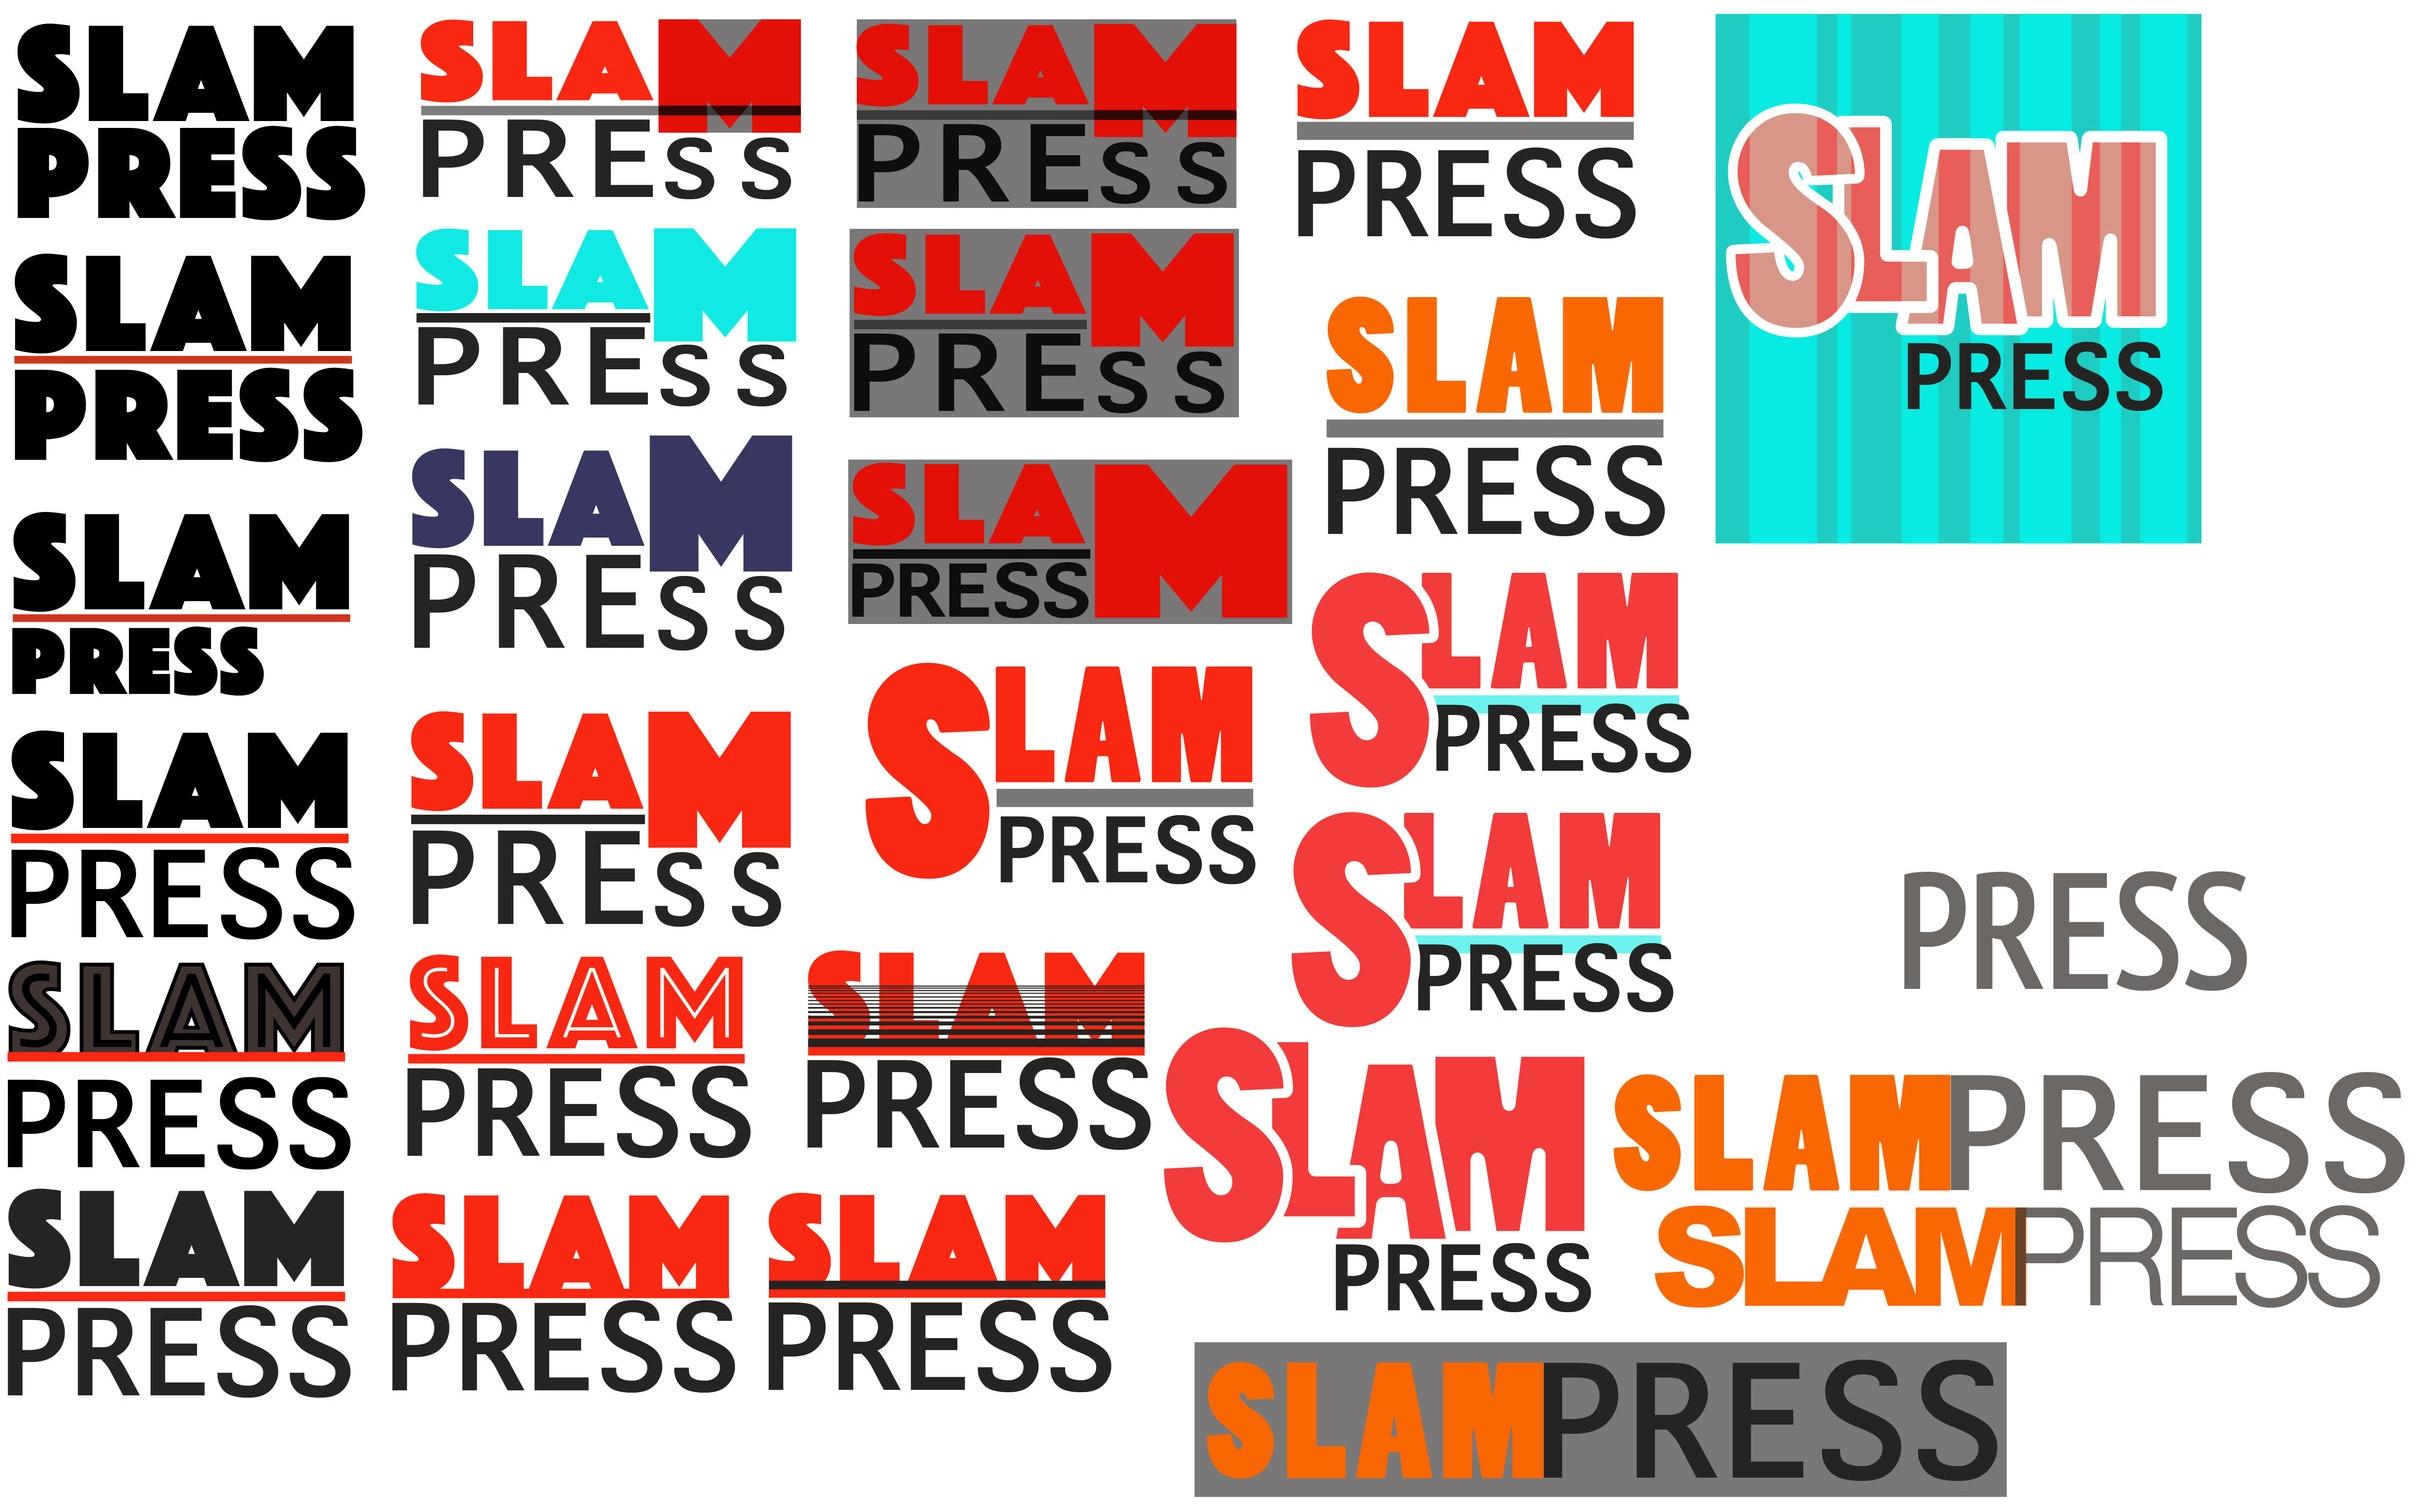 SLAMPRESS LOGO DESIGNS01C.jpg